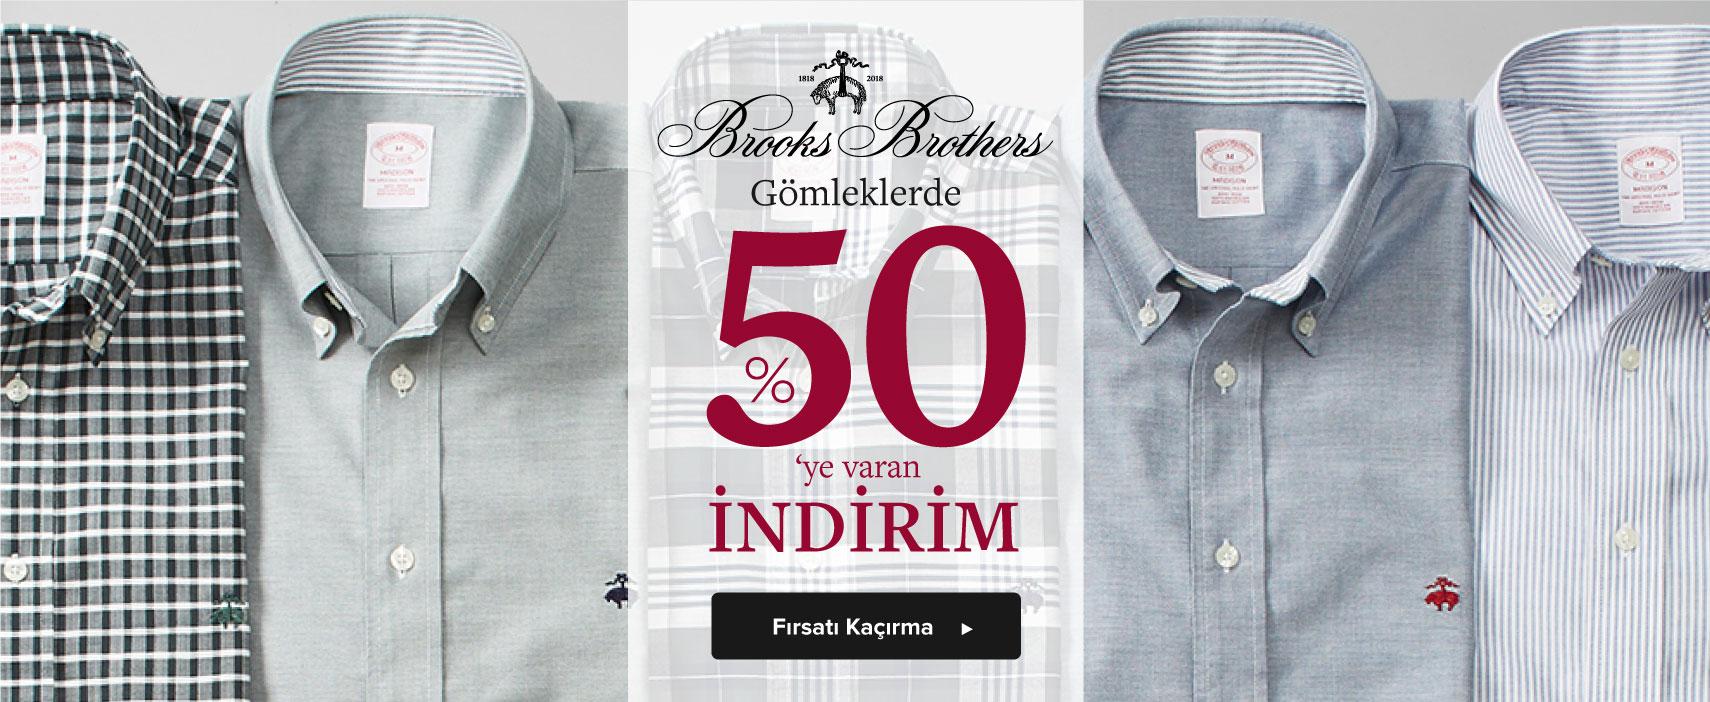 BROOKS BROTHERS GÖMLEKLERDE %50'YE VARAN İNDİRİM